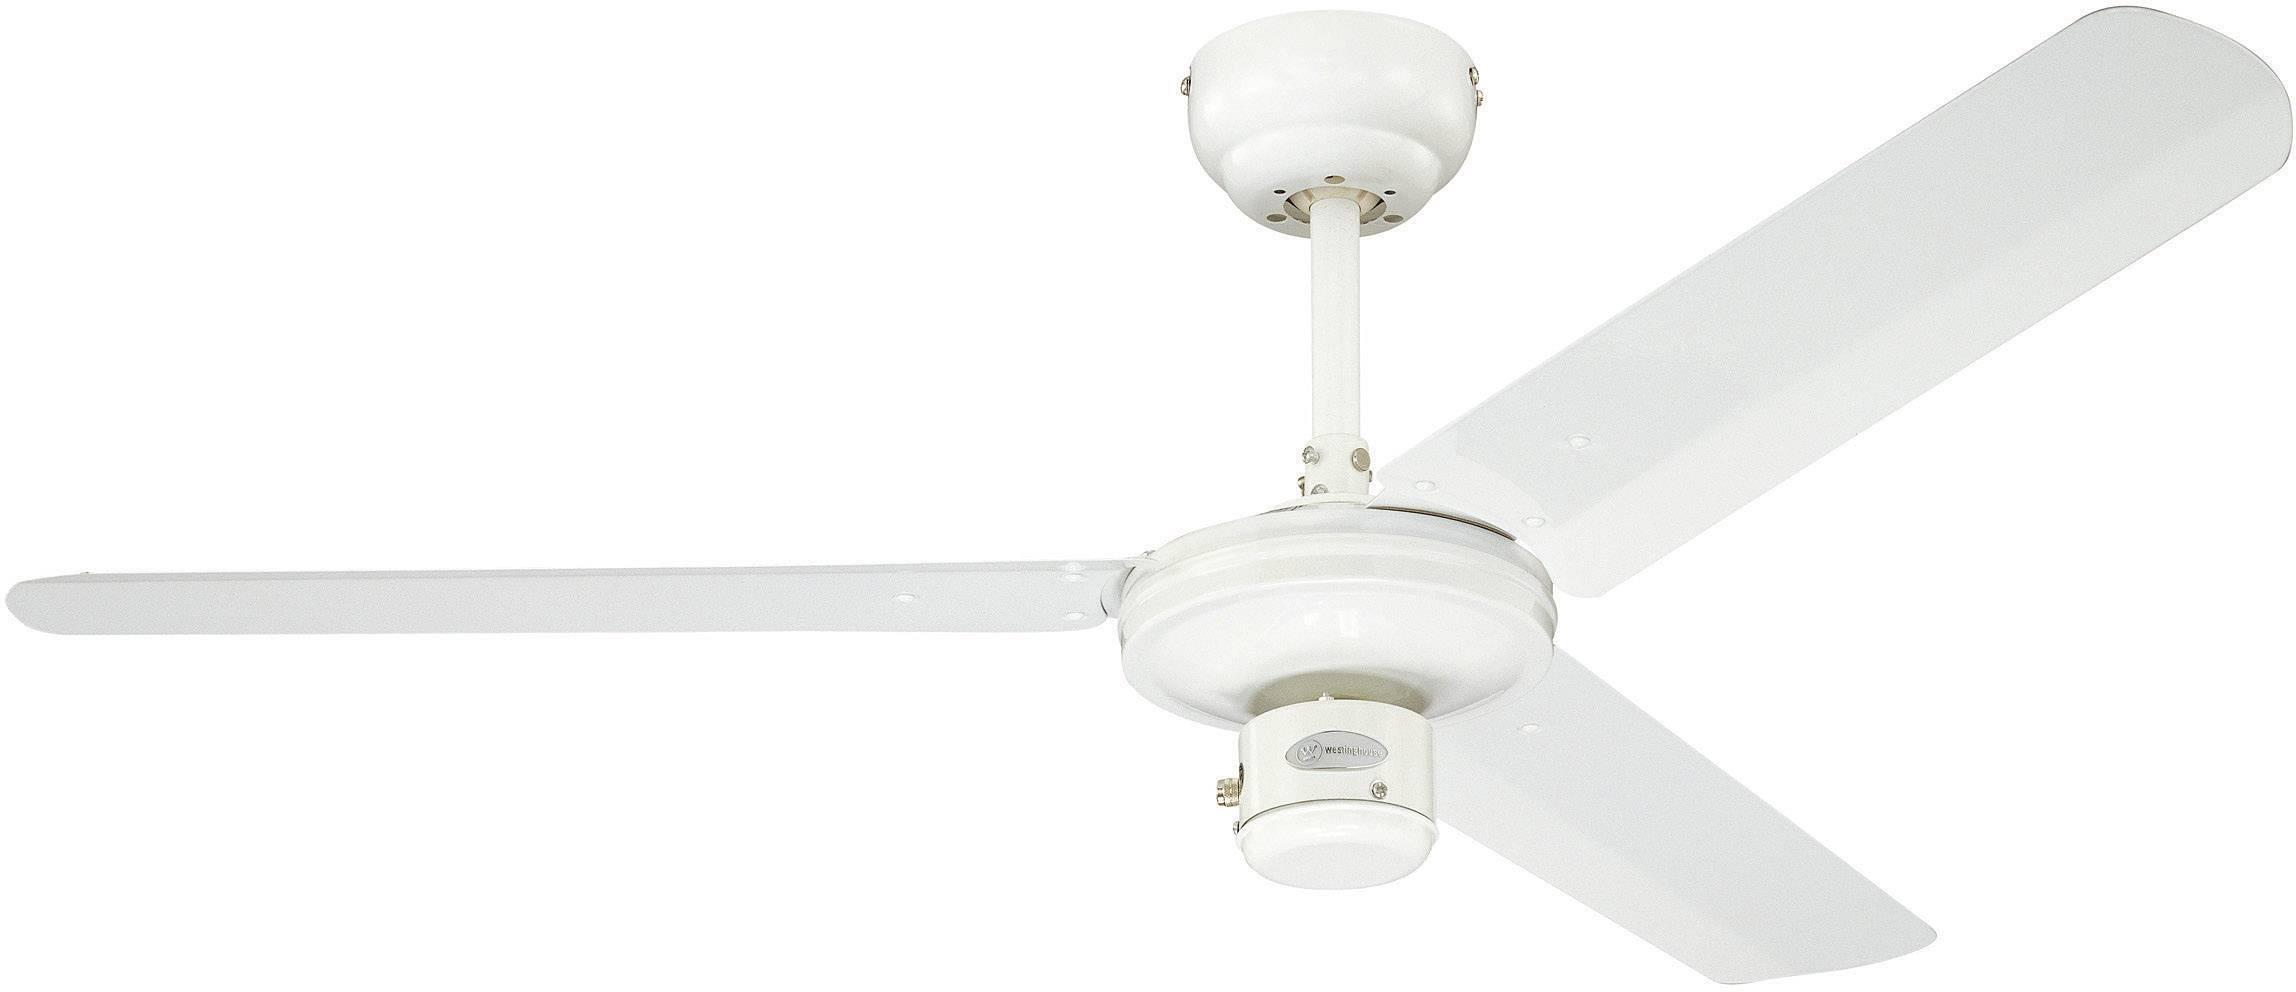 Stropní ventilátor Westinghouse Industrial, 3 lopatky, Ø 122 cm, bílá/bílá